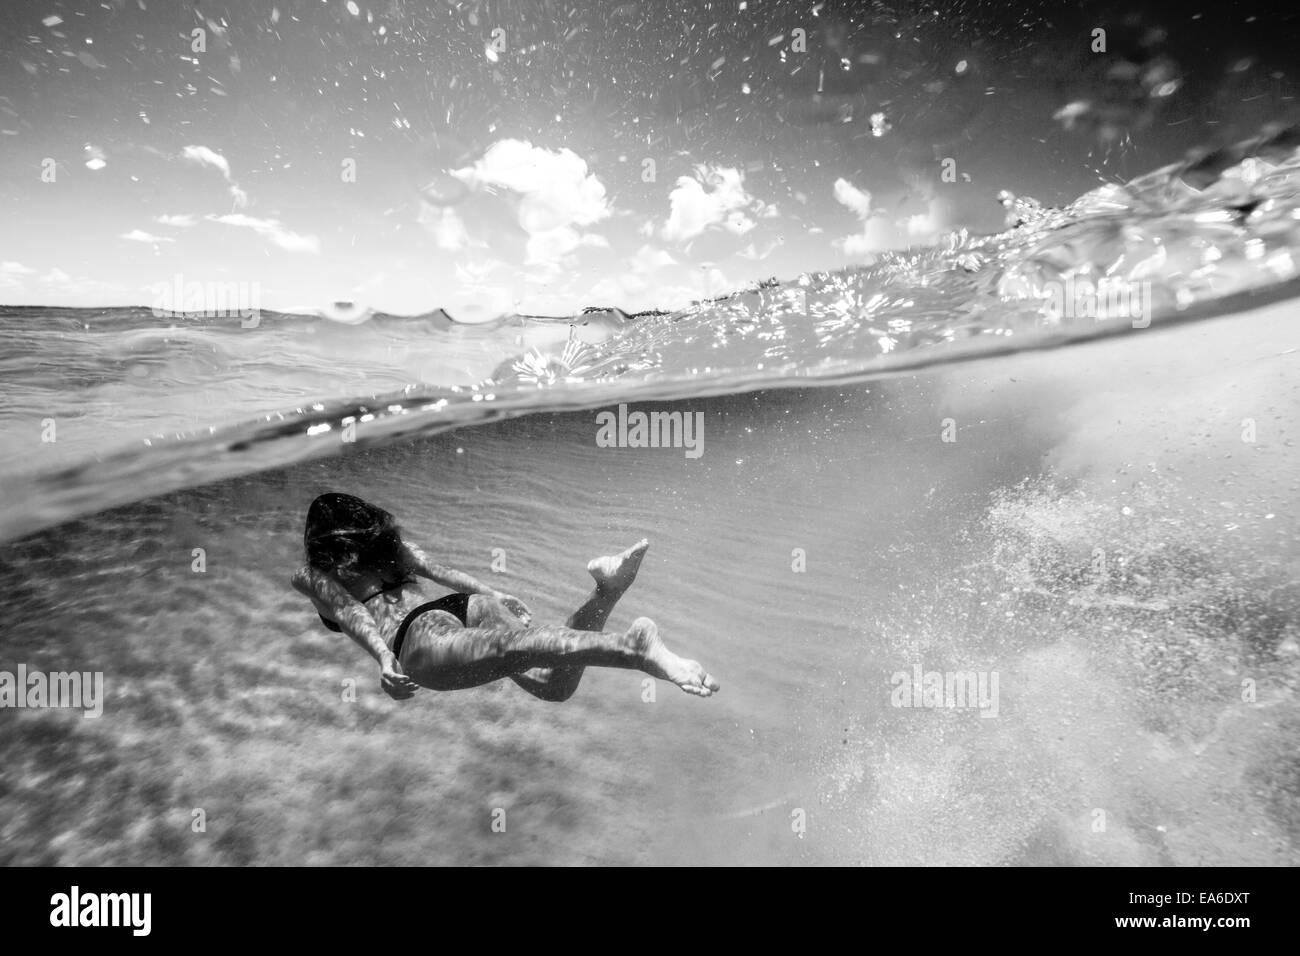 Mujer nadar Imagen De Stock